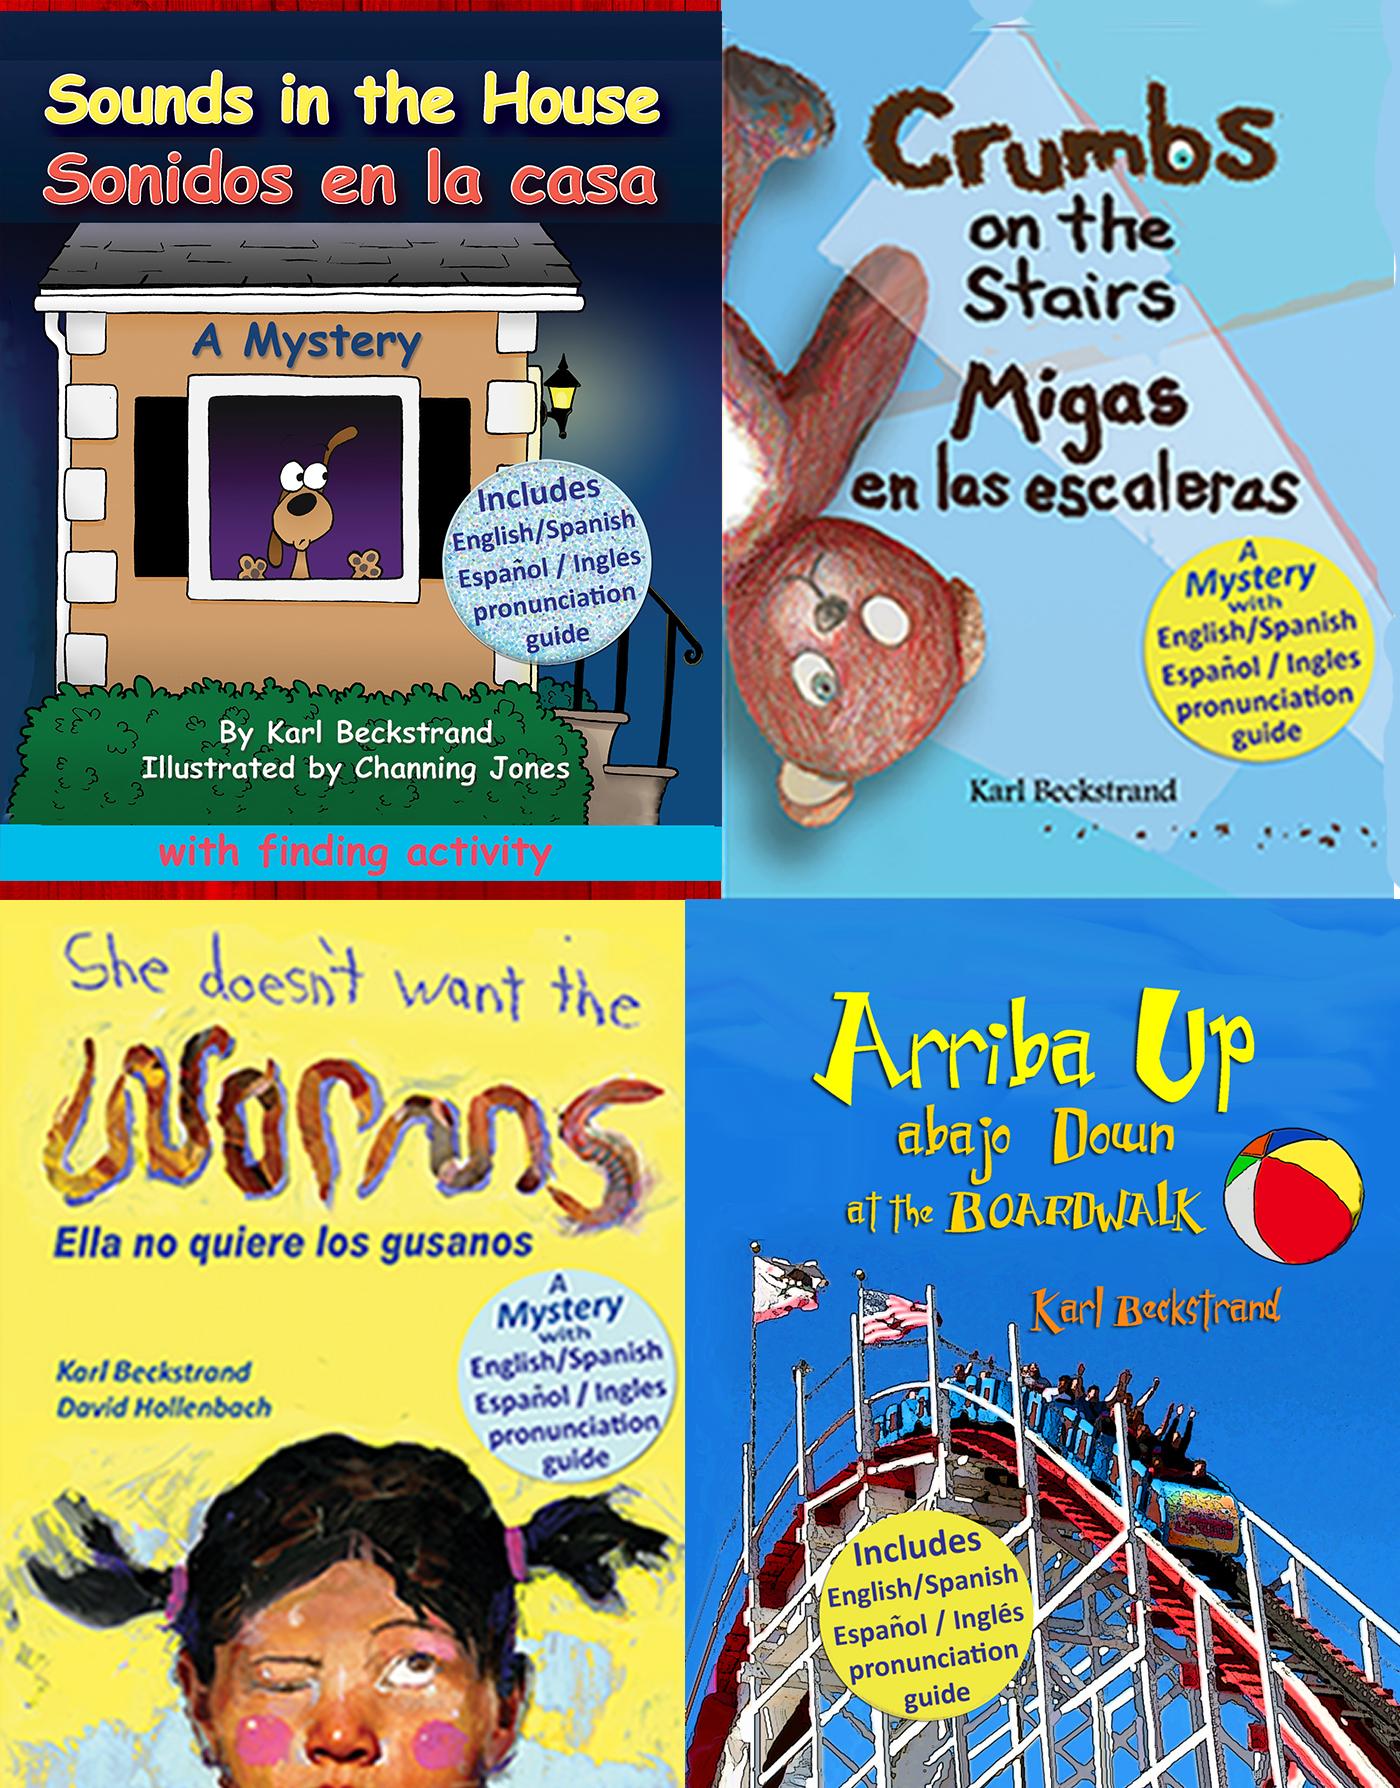 Karl Beckstrand - Four Spanish-English Children's Books (box set with pronunciation guide)